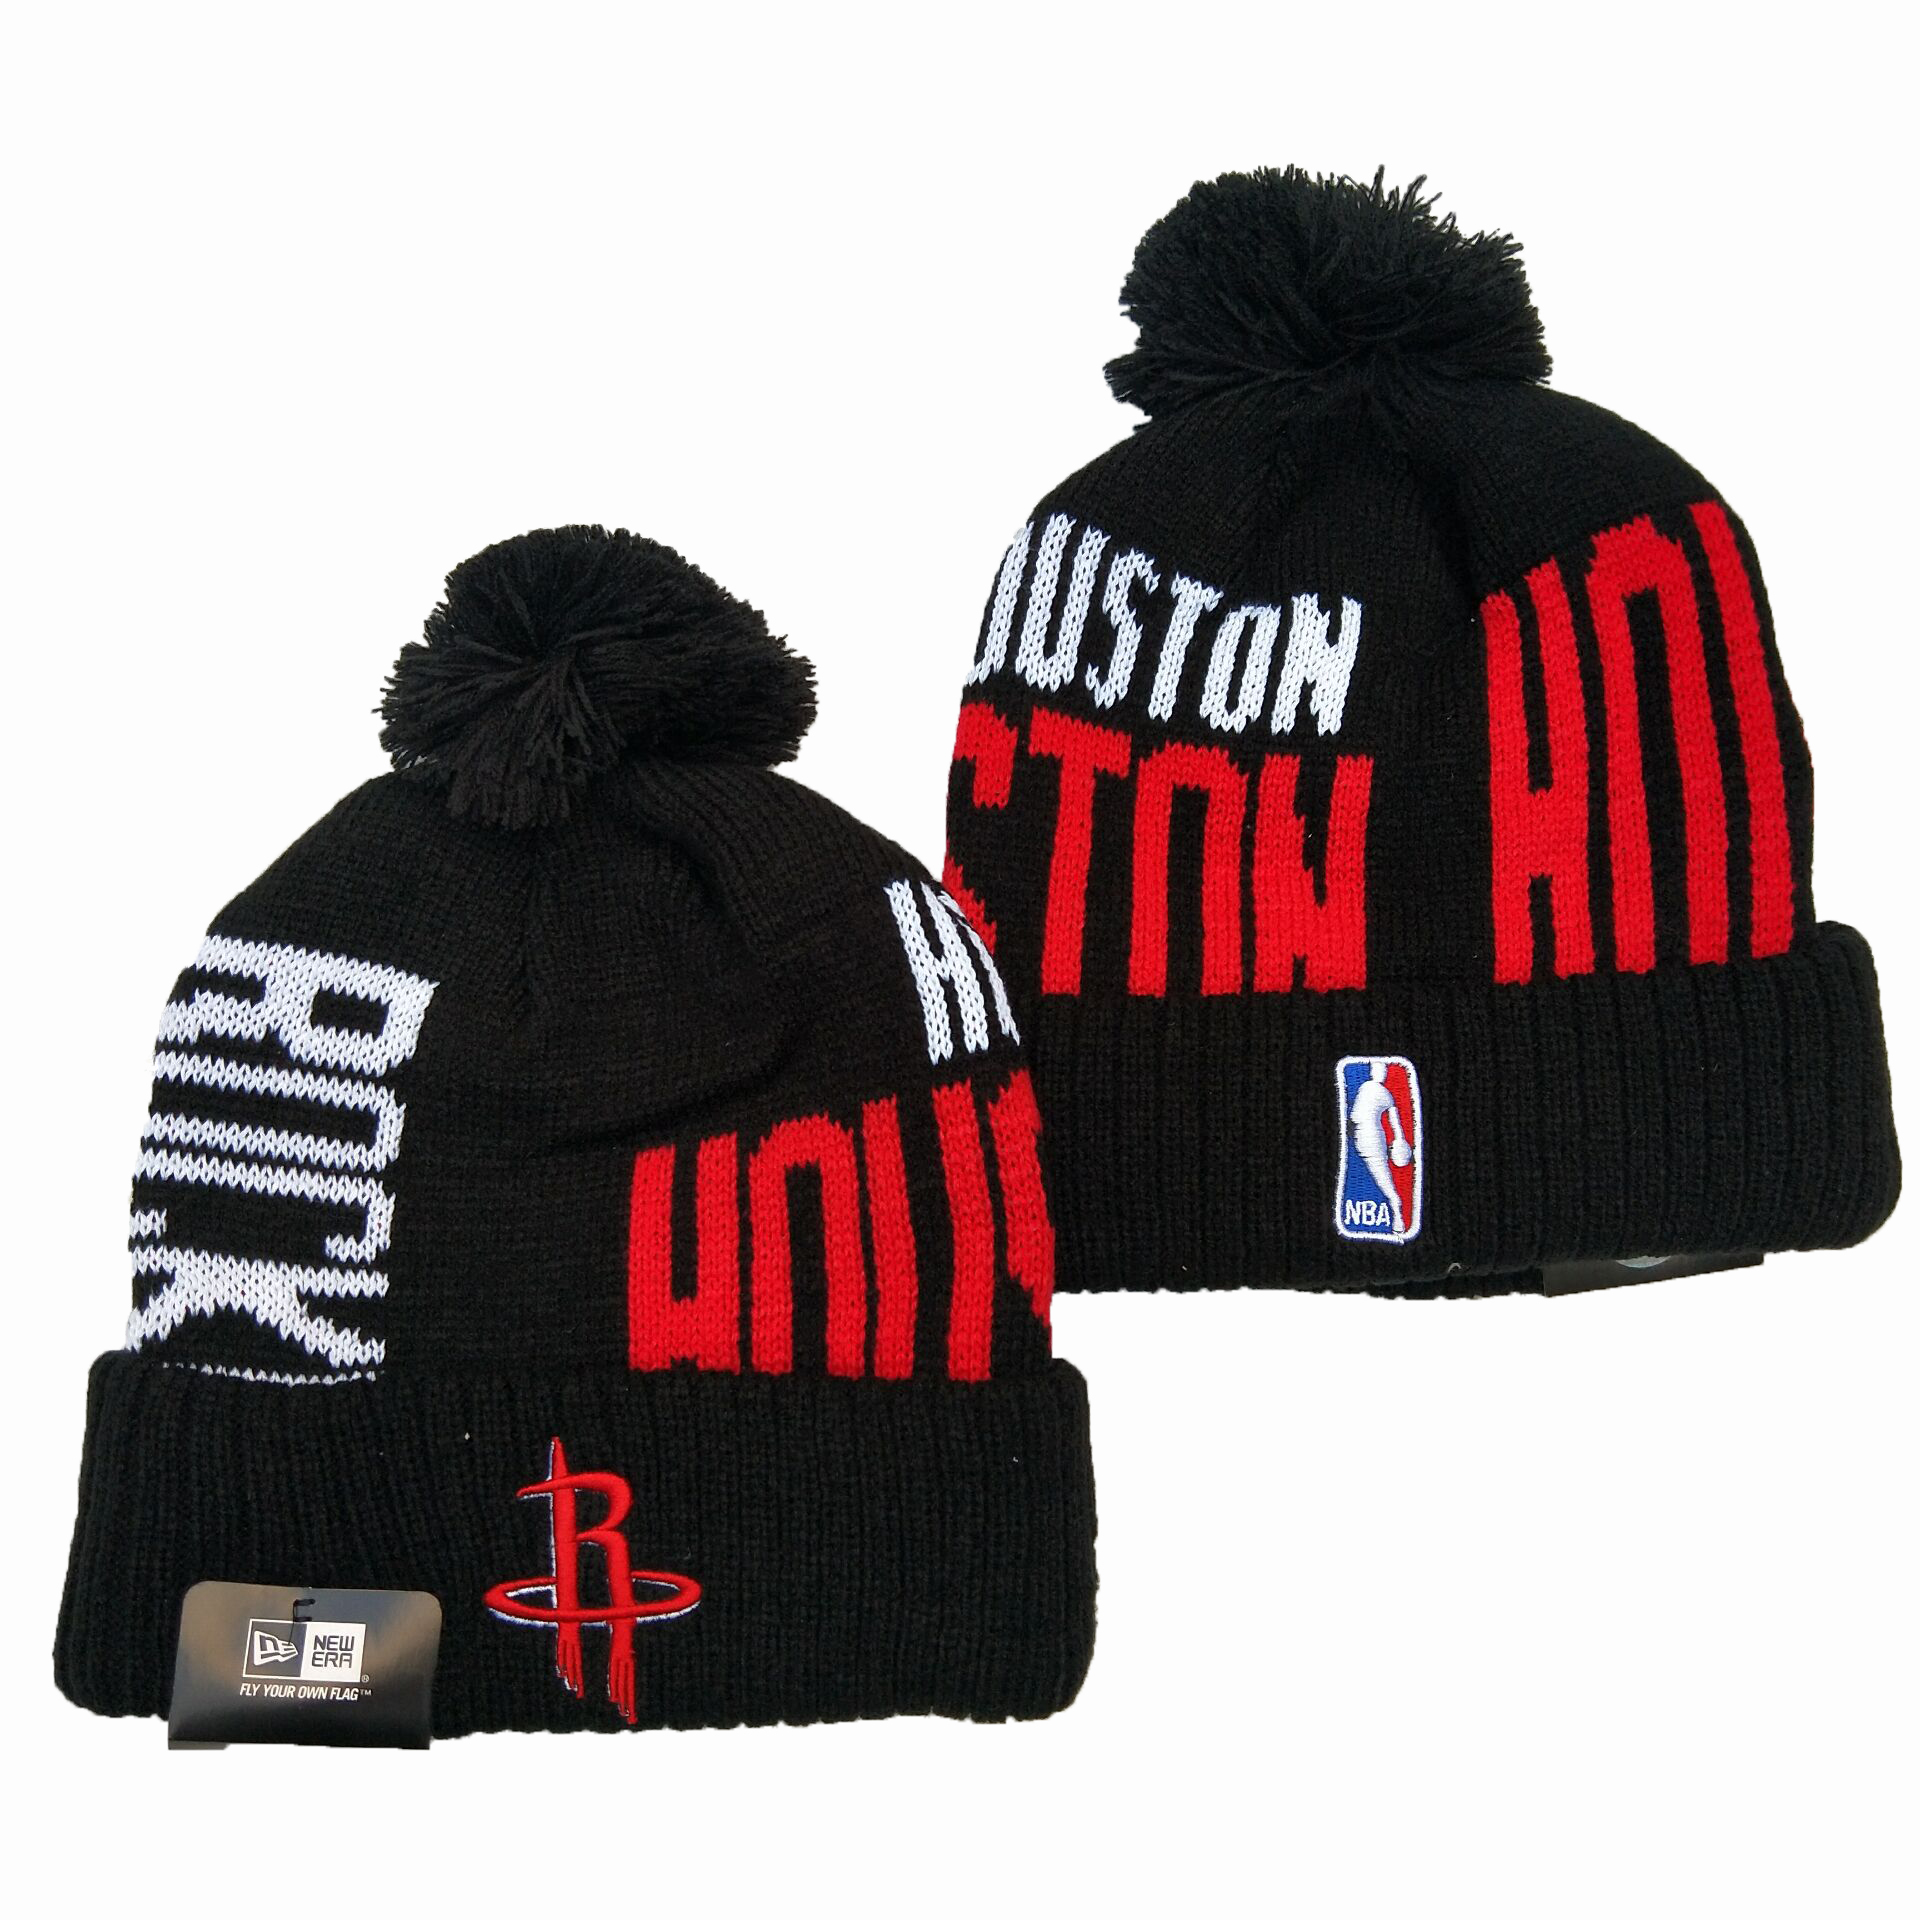 Rockets Team Logo Black Pom Knit Hat YD